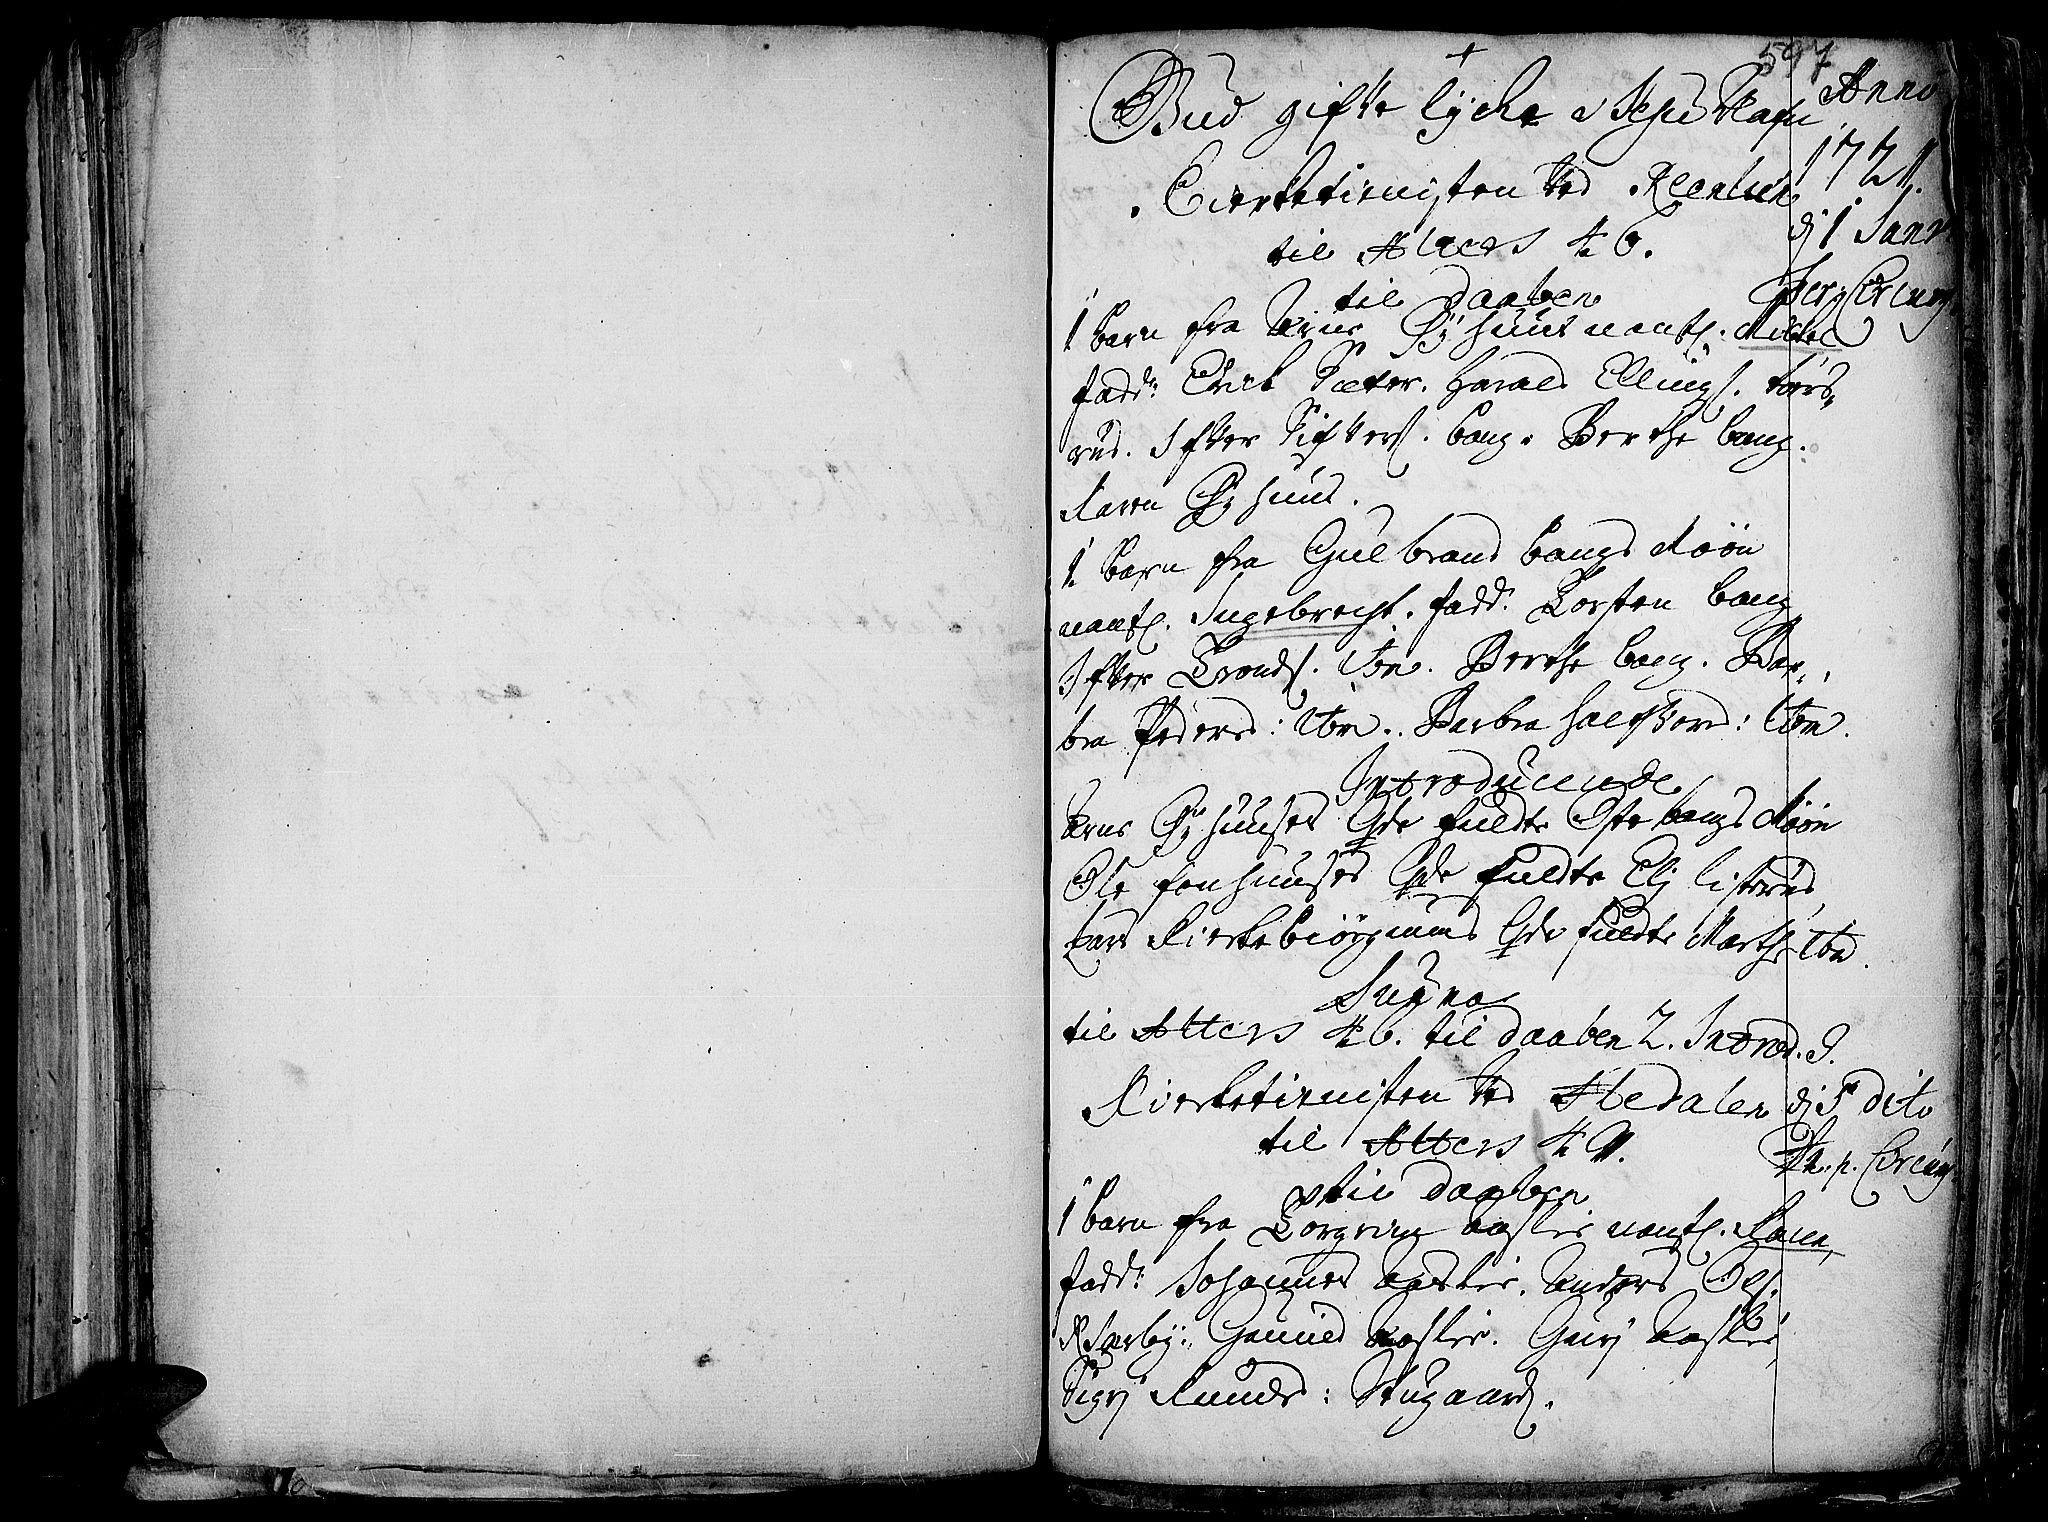 SAH, Aurdal prestekontor, Ministerialbok nr. 1-3, 1692-1730, s. 597